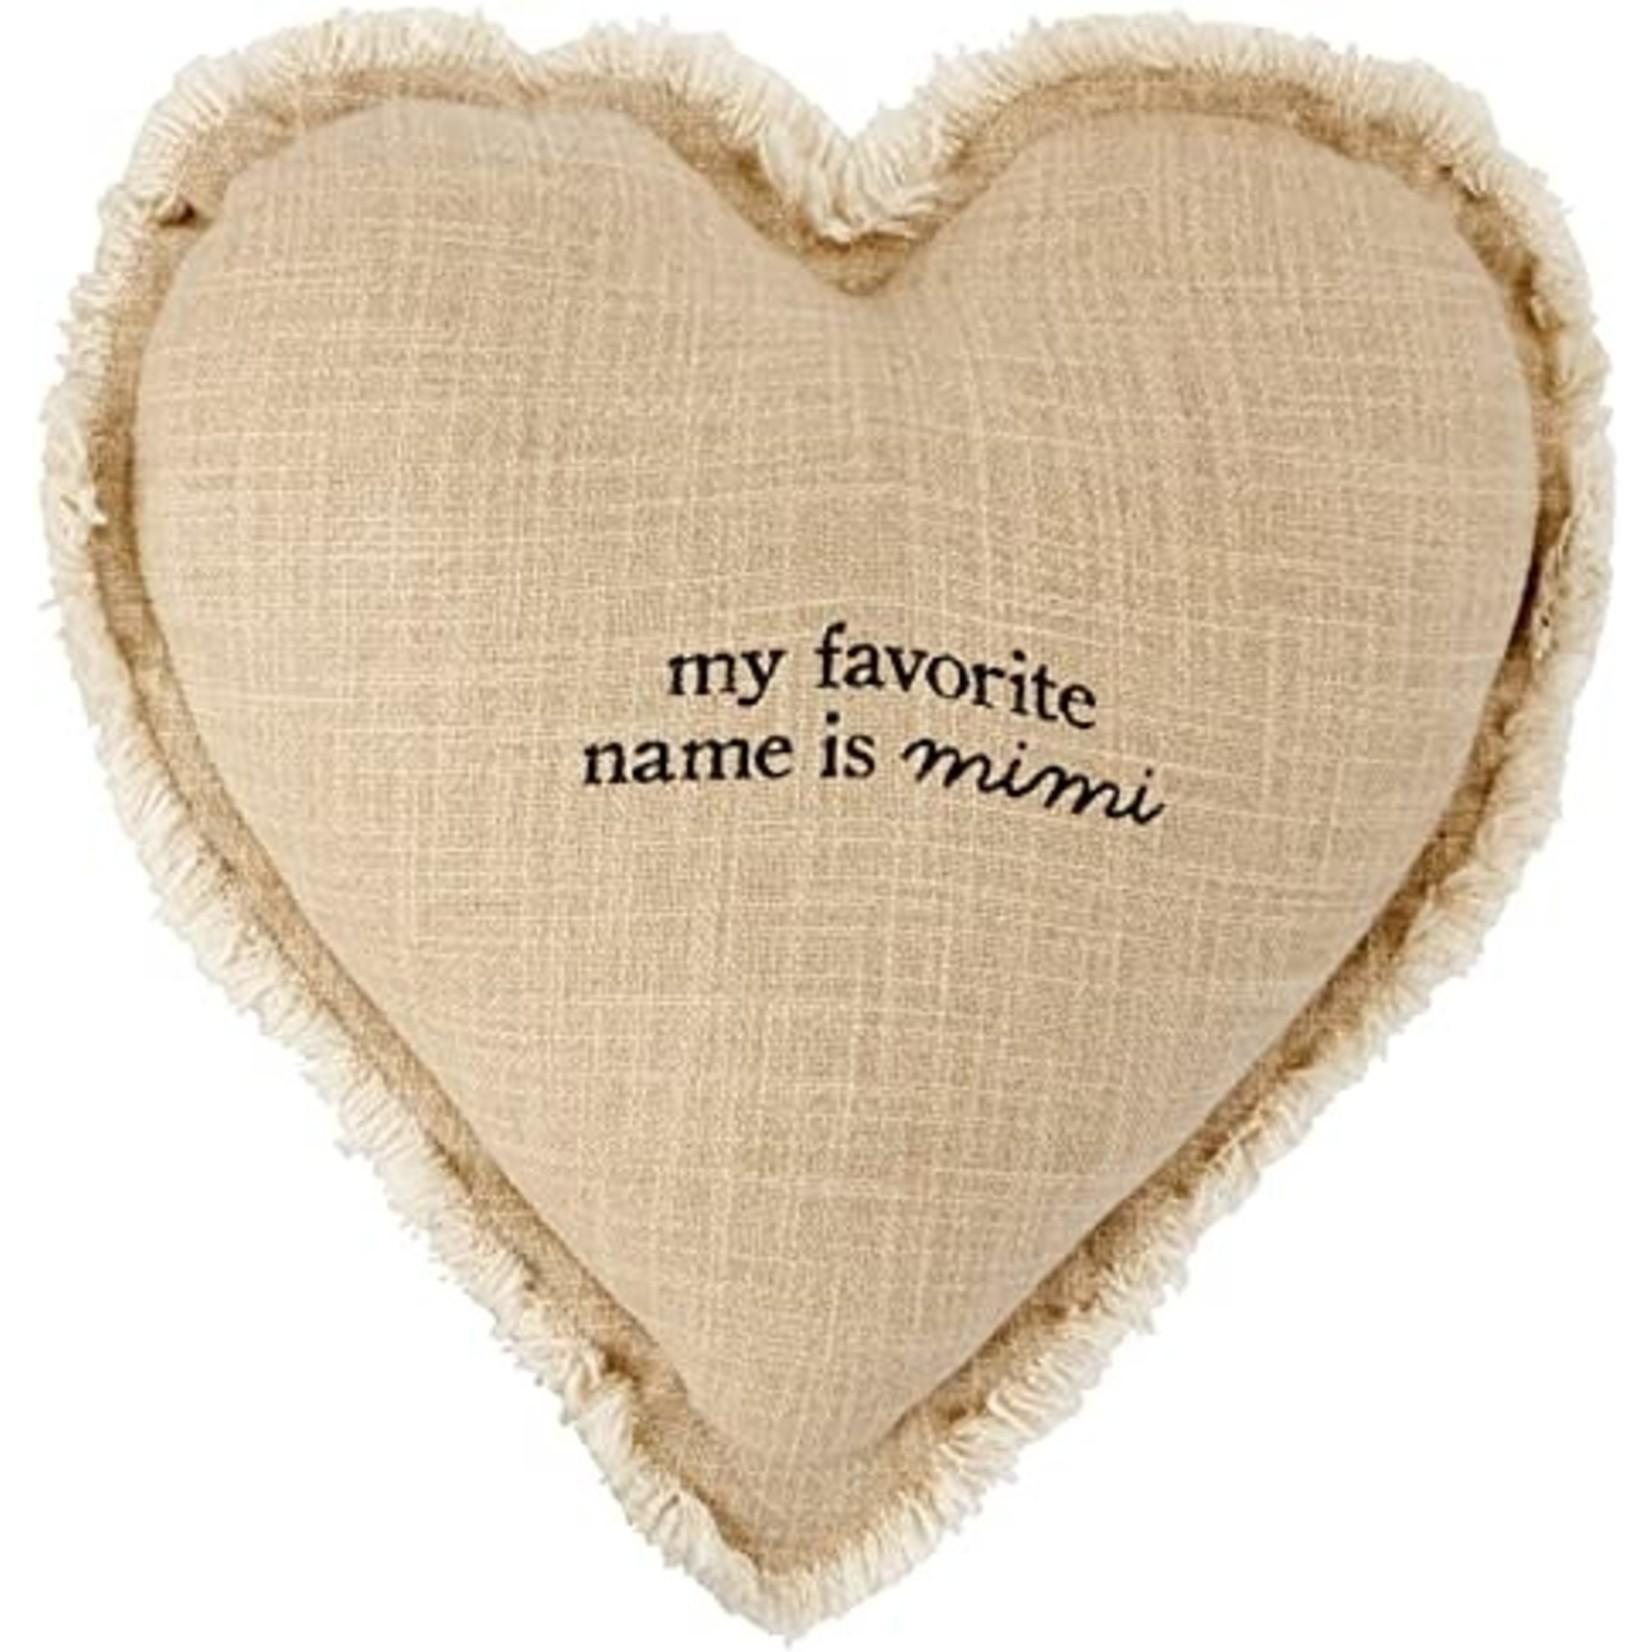 Mud Pie Grandma Heart Pillow, Mimi